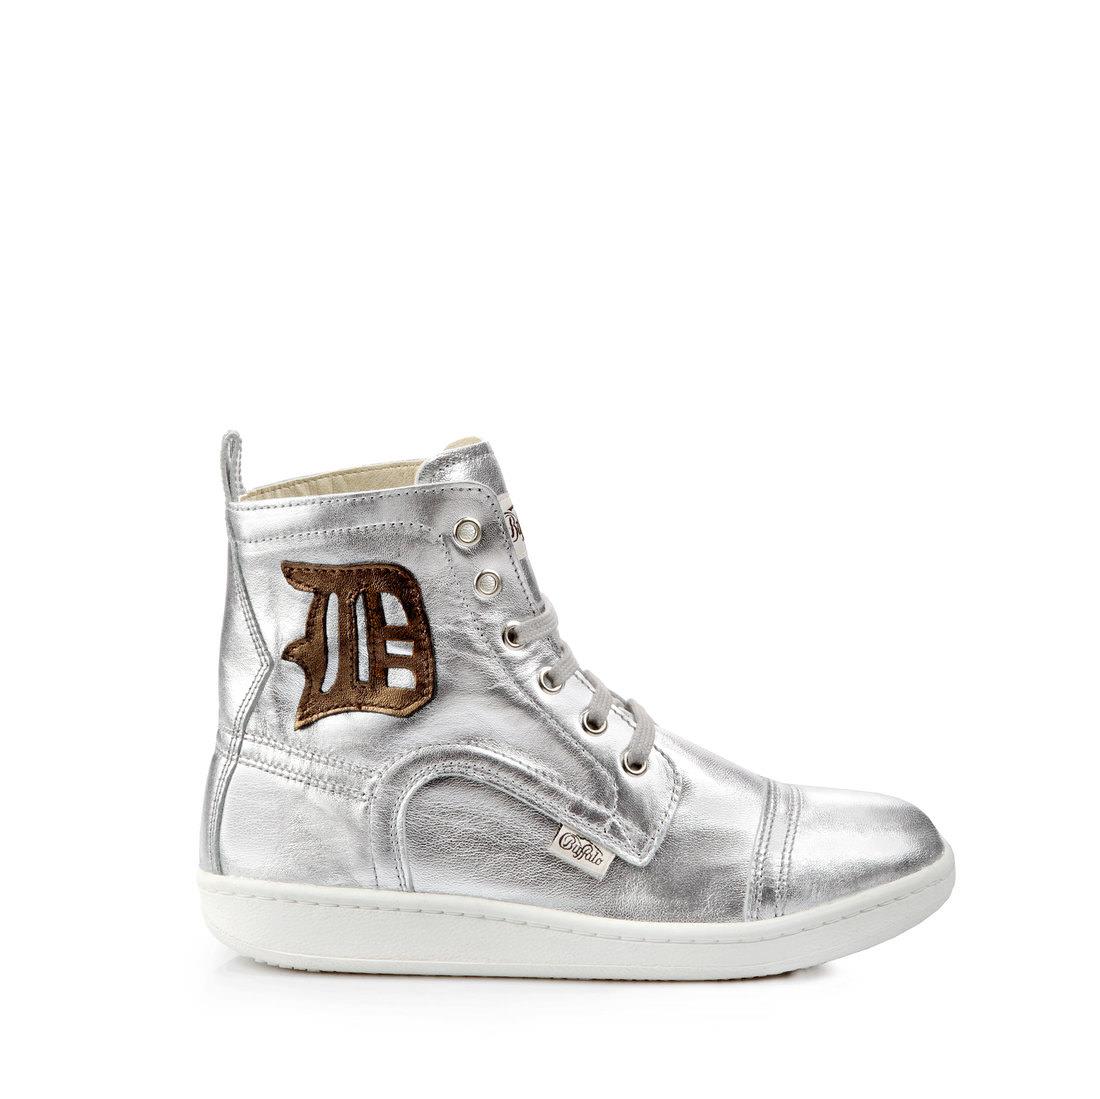 Sneaker Buffalo Online KaufenBuffalo® High Silber Aus Top Leder FK3J1uTlc